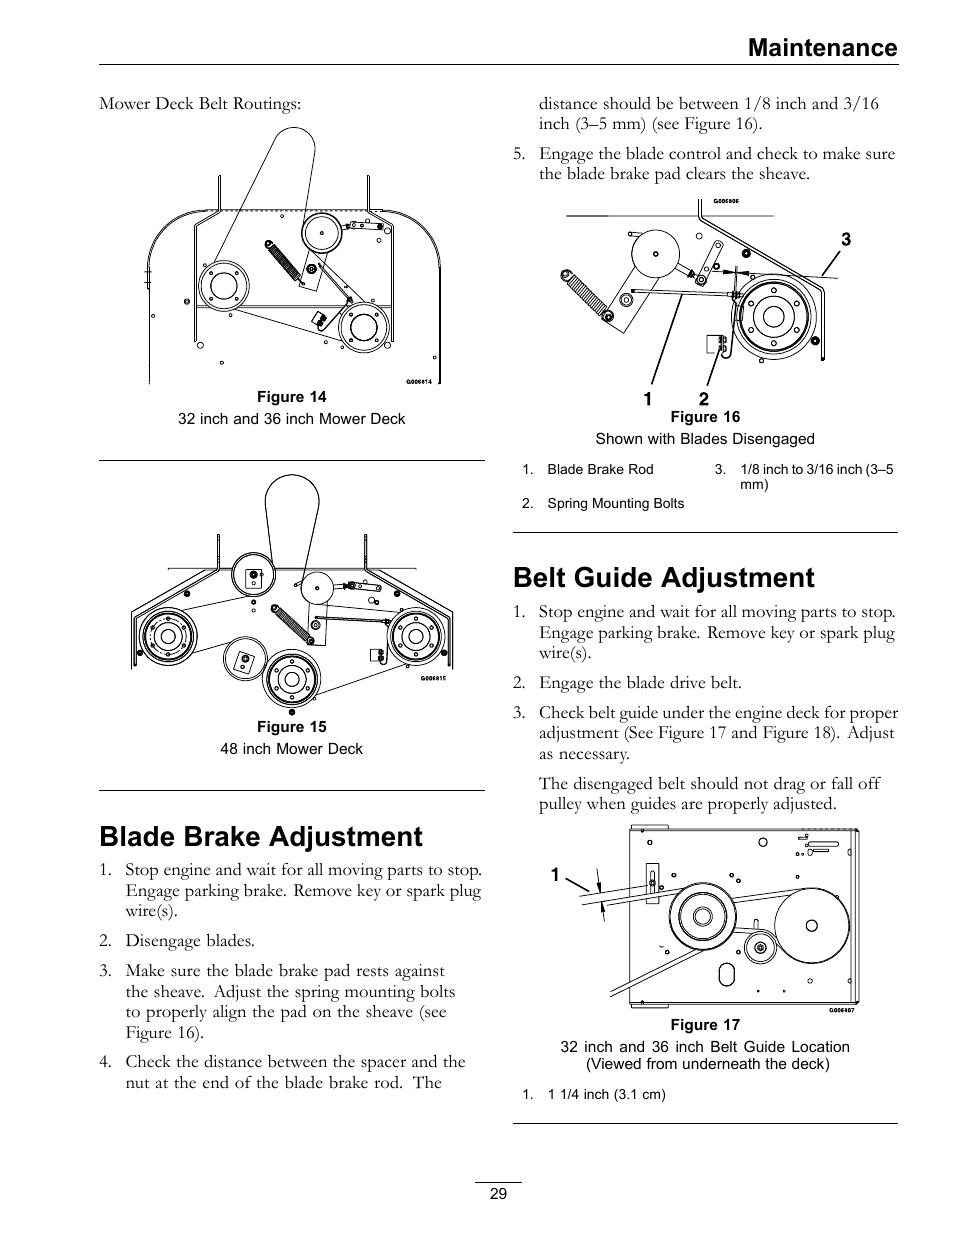 Blade Brake Adjustment Belt Guide Adjustment Maintenance Exmark Metro 4500 352 User Manual Page 29 40